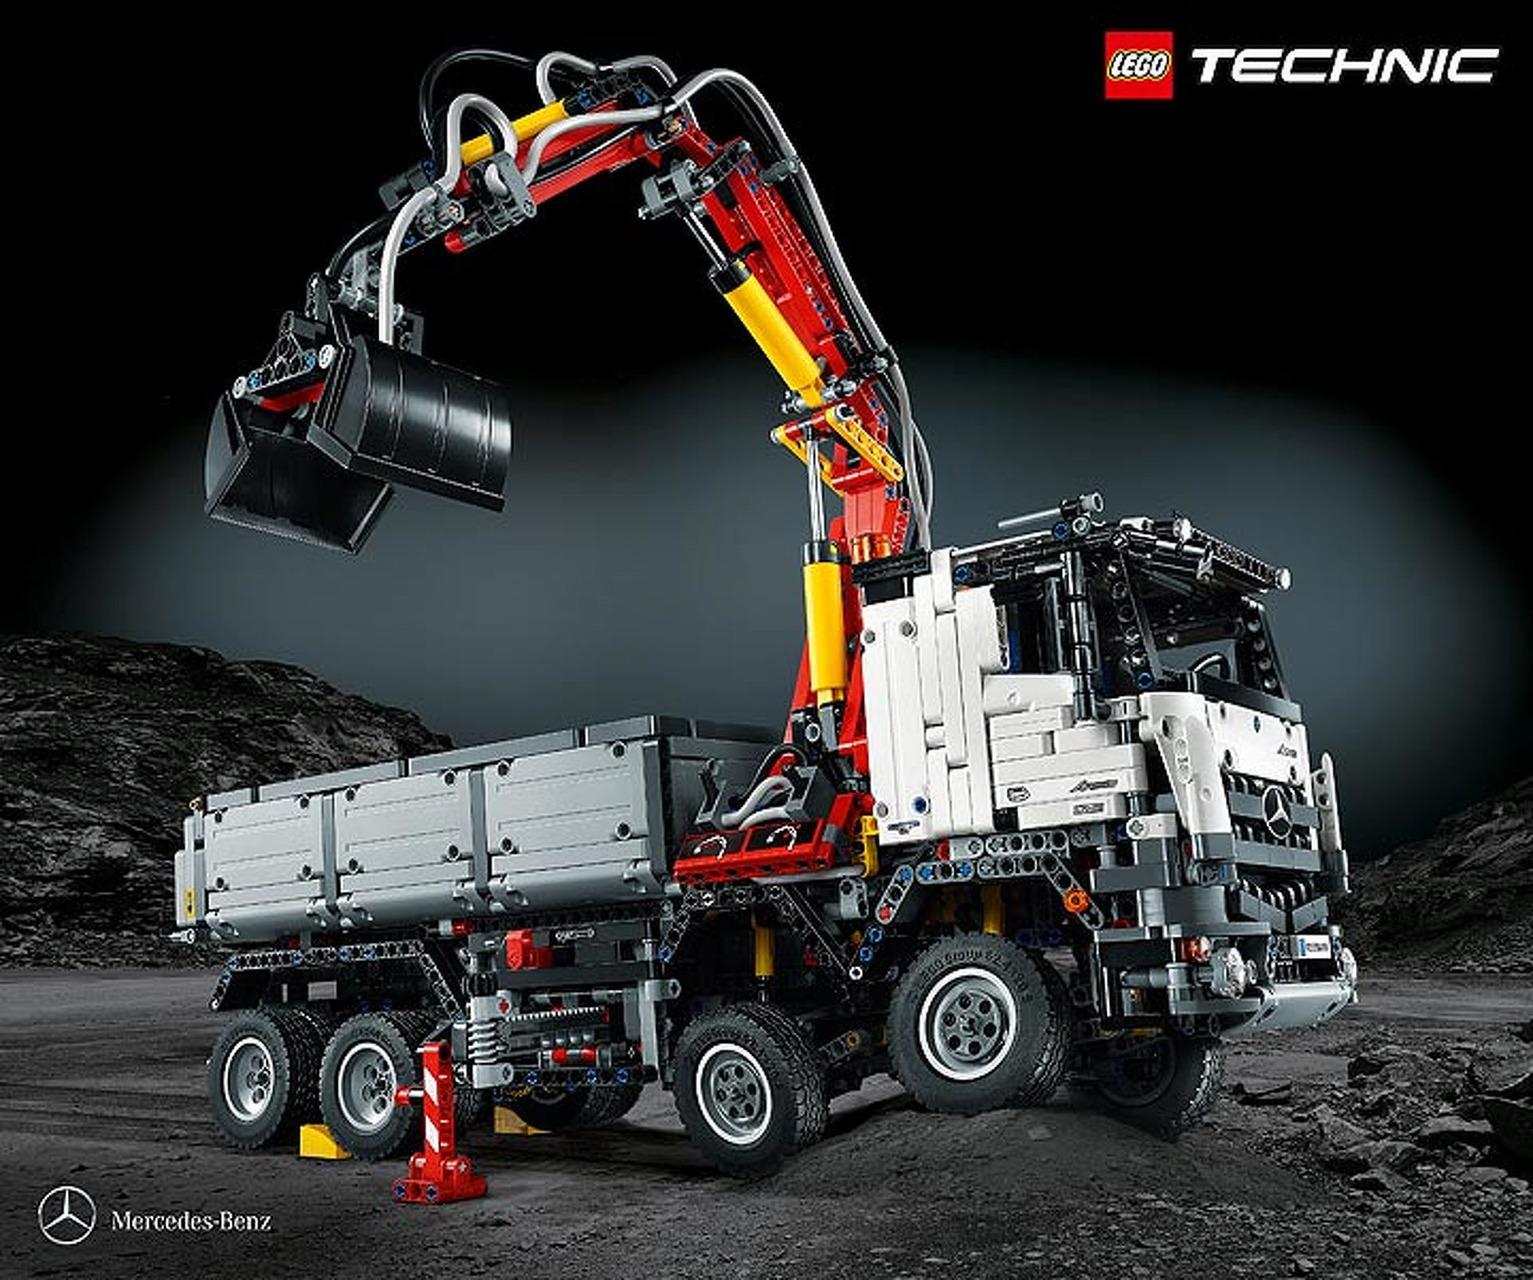 LEGO Brings Mercedes Trucks to a Living Room Near You